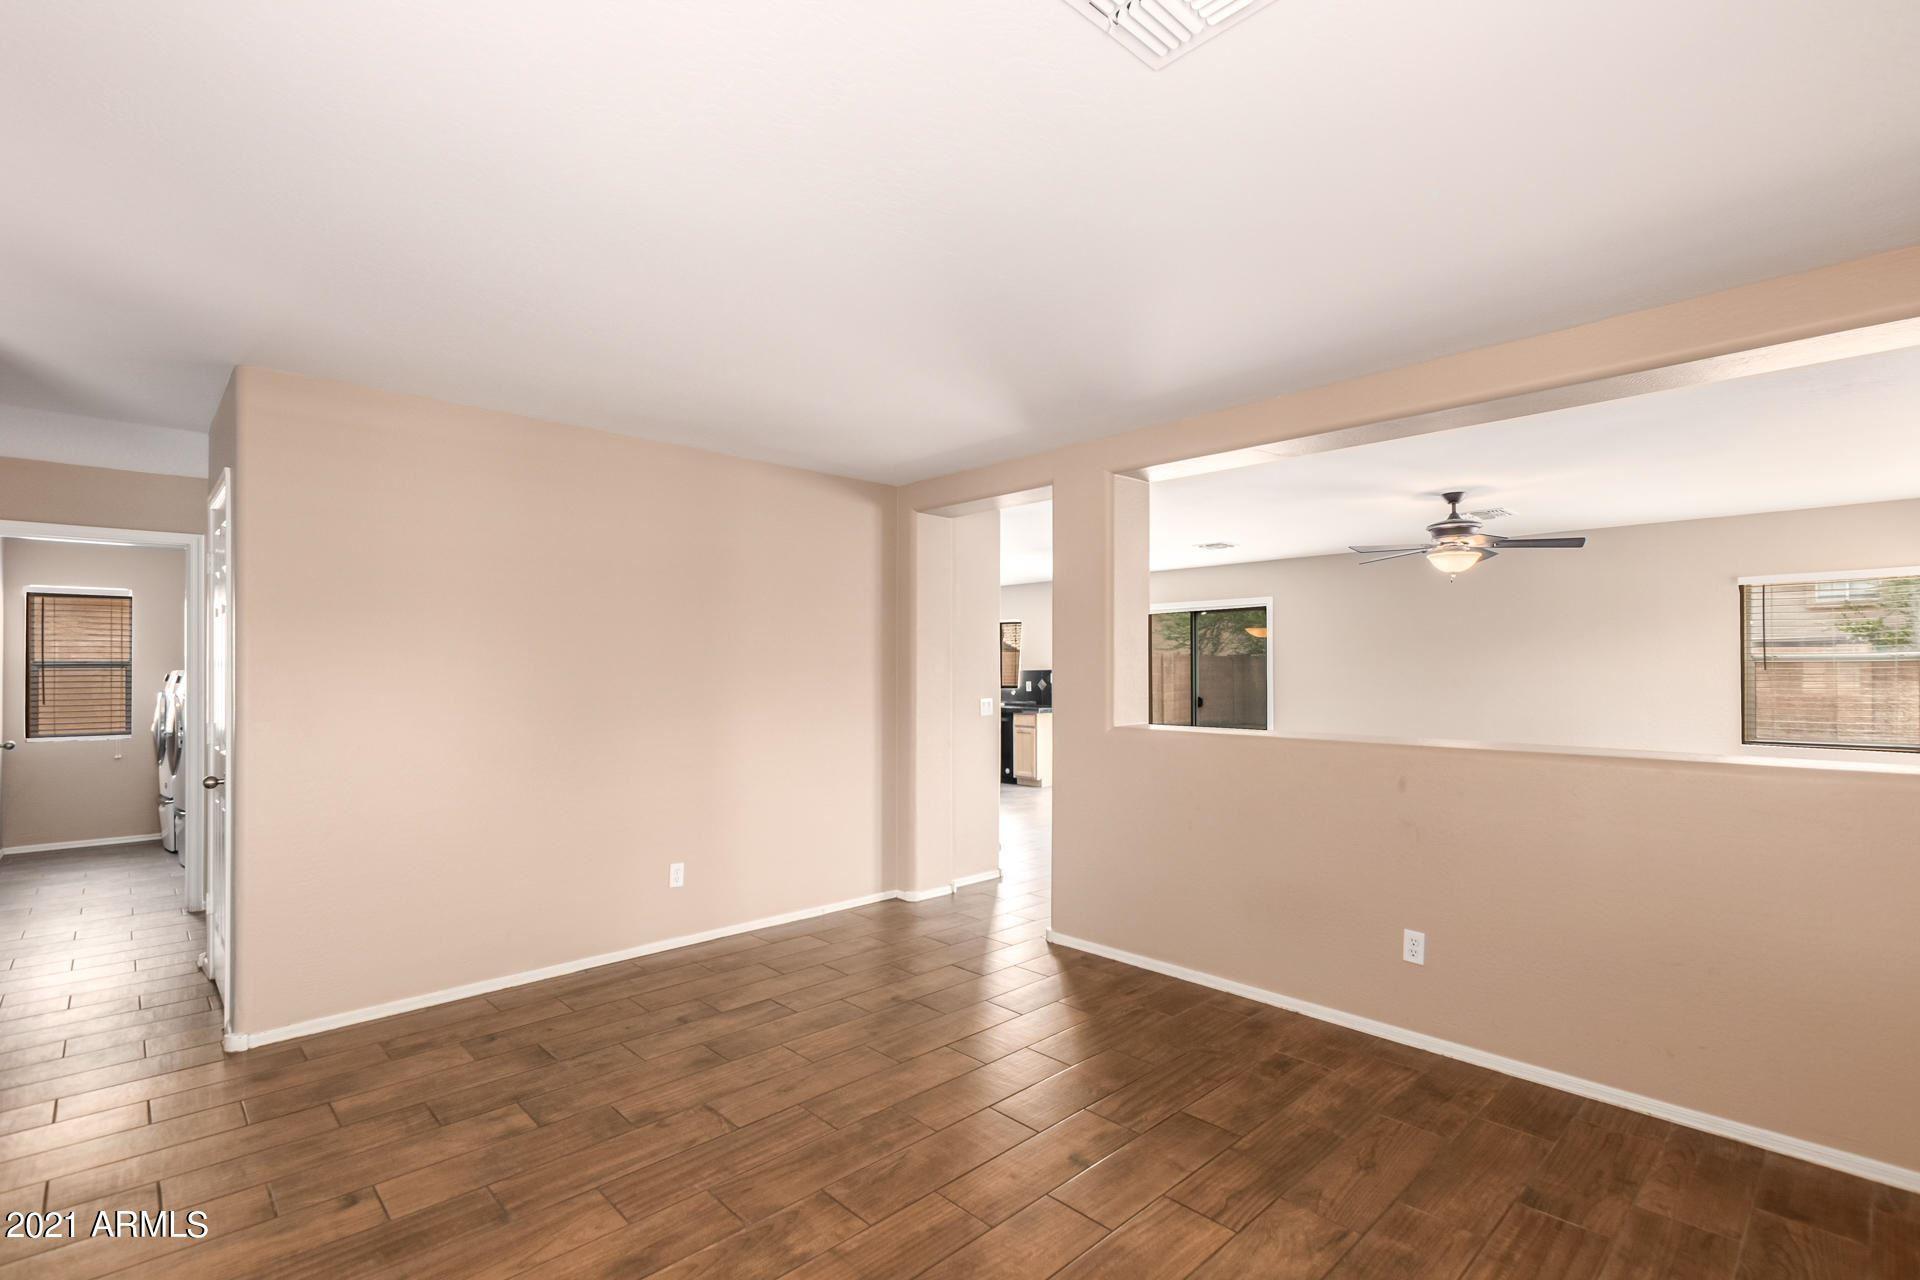 Photo of 11649 W BROWN Street, Youngtown, AZ 85363 (MLS # 6268826)